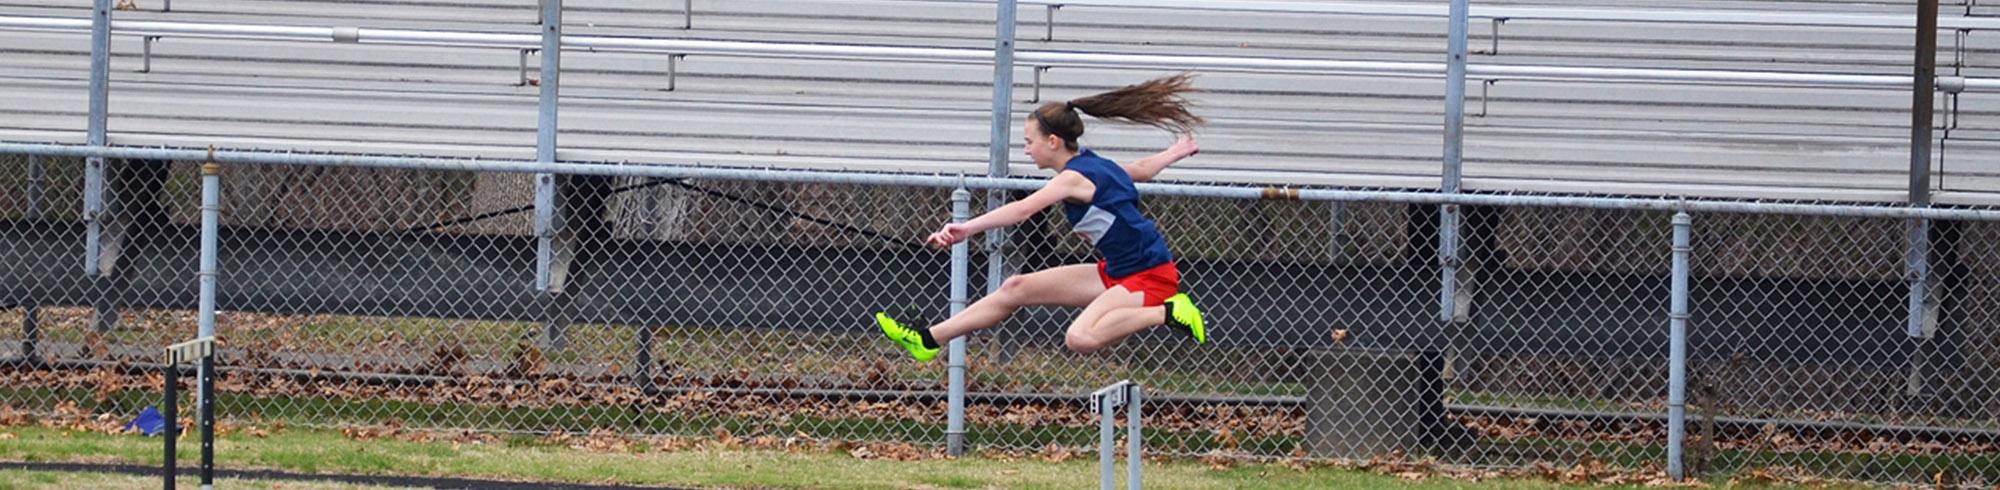 High school athlete practicing hurdles on the school track